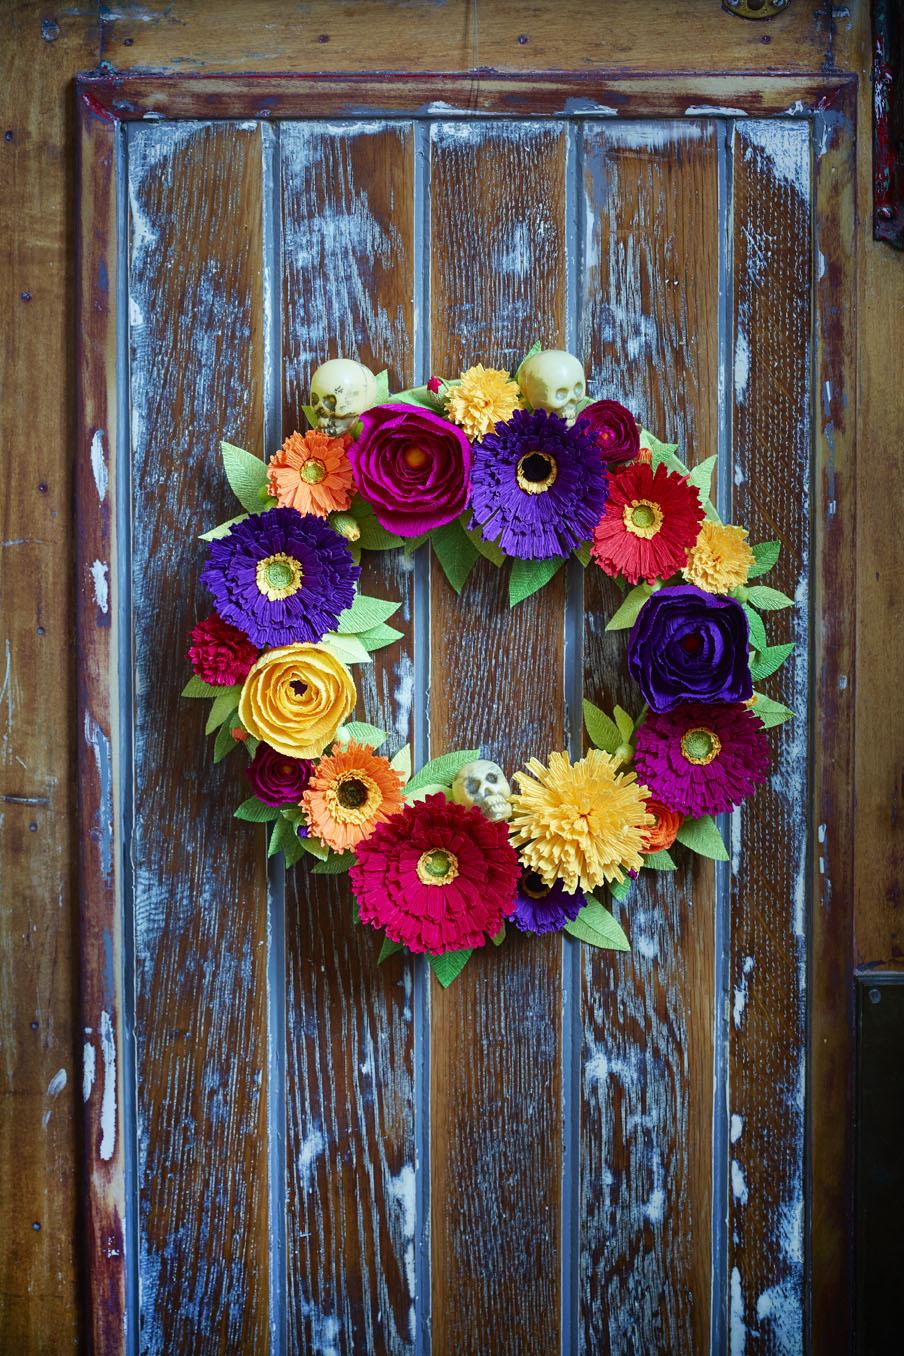 Wreath_001_WEB.jpg